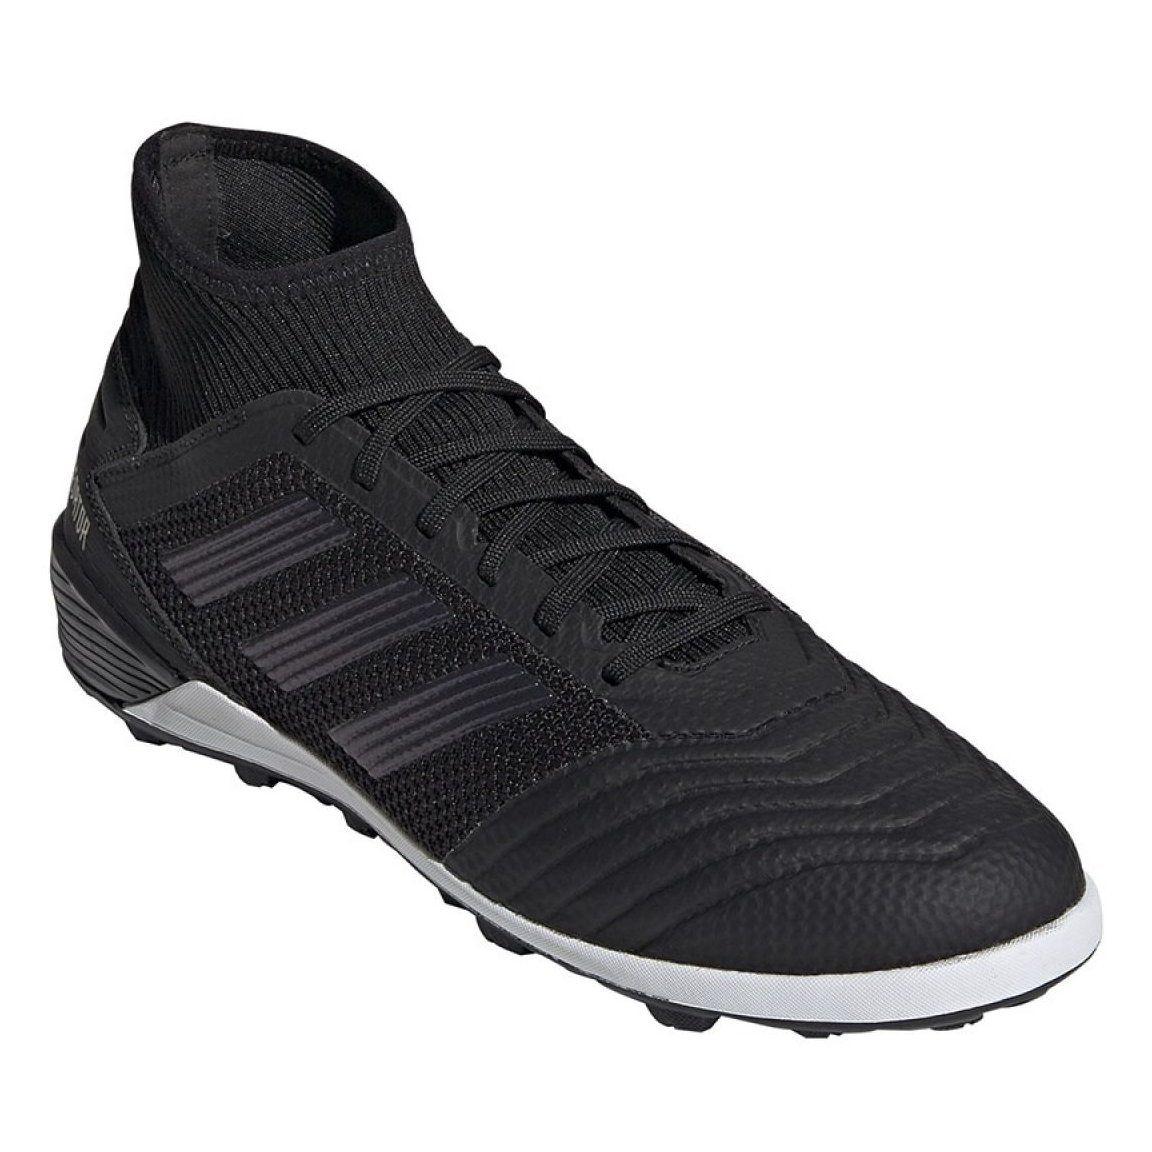 Buty Pilkarskie Adidas Predator 19 3 Tf M F35627 Czarne Czarne Football Boots Adidas Sneakers Adidas